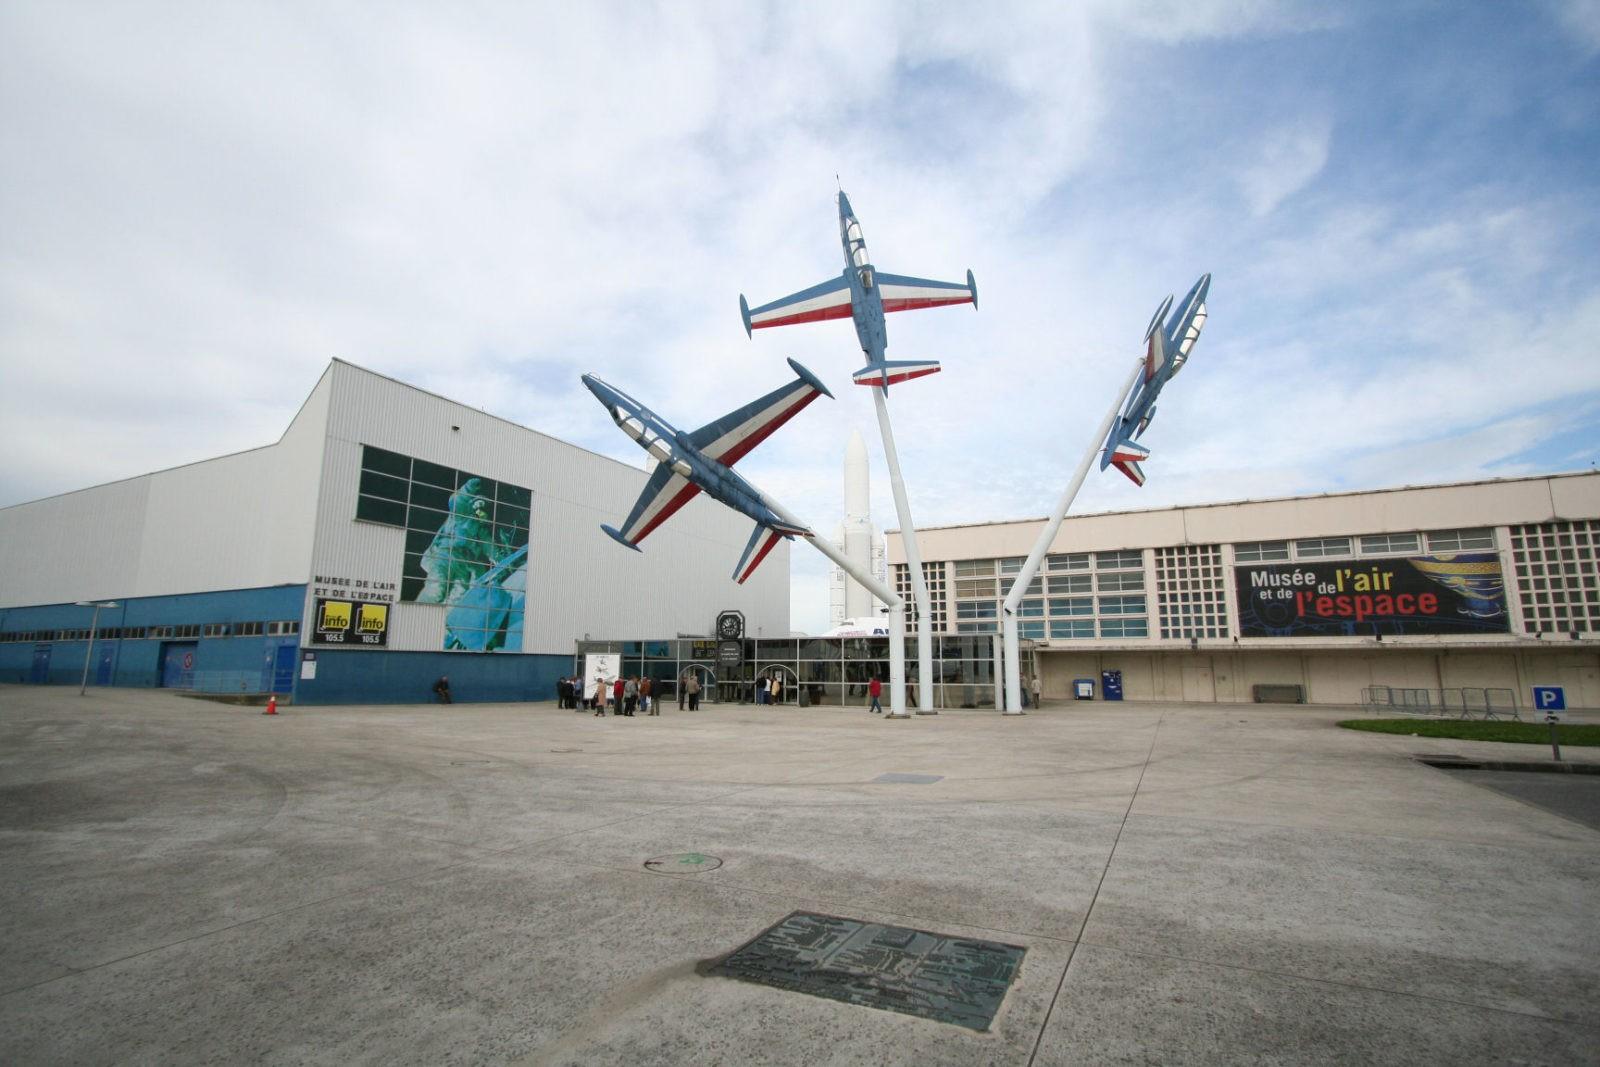 Информация про аэропорт Ле Бурже